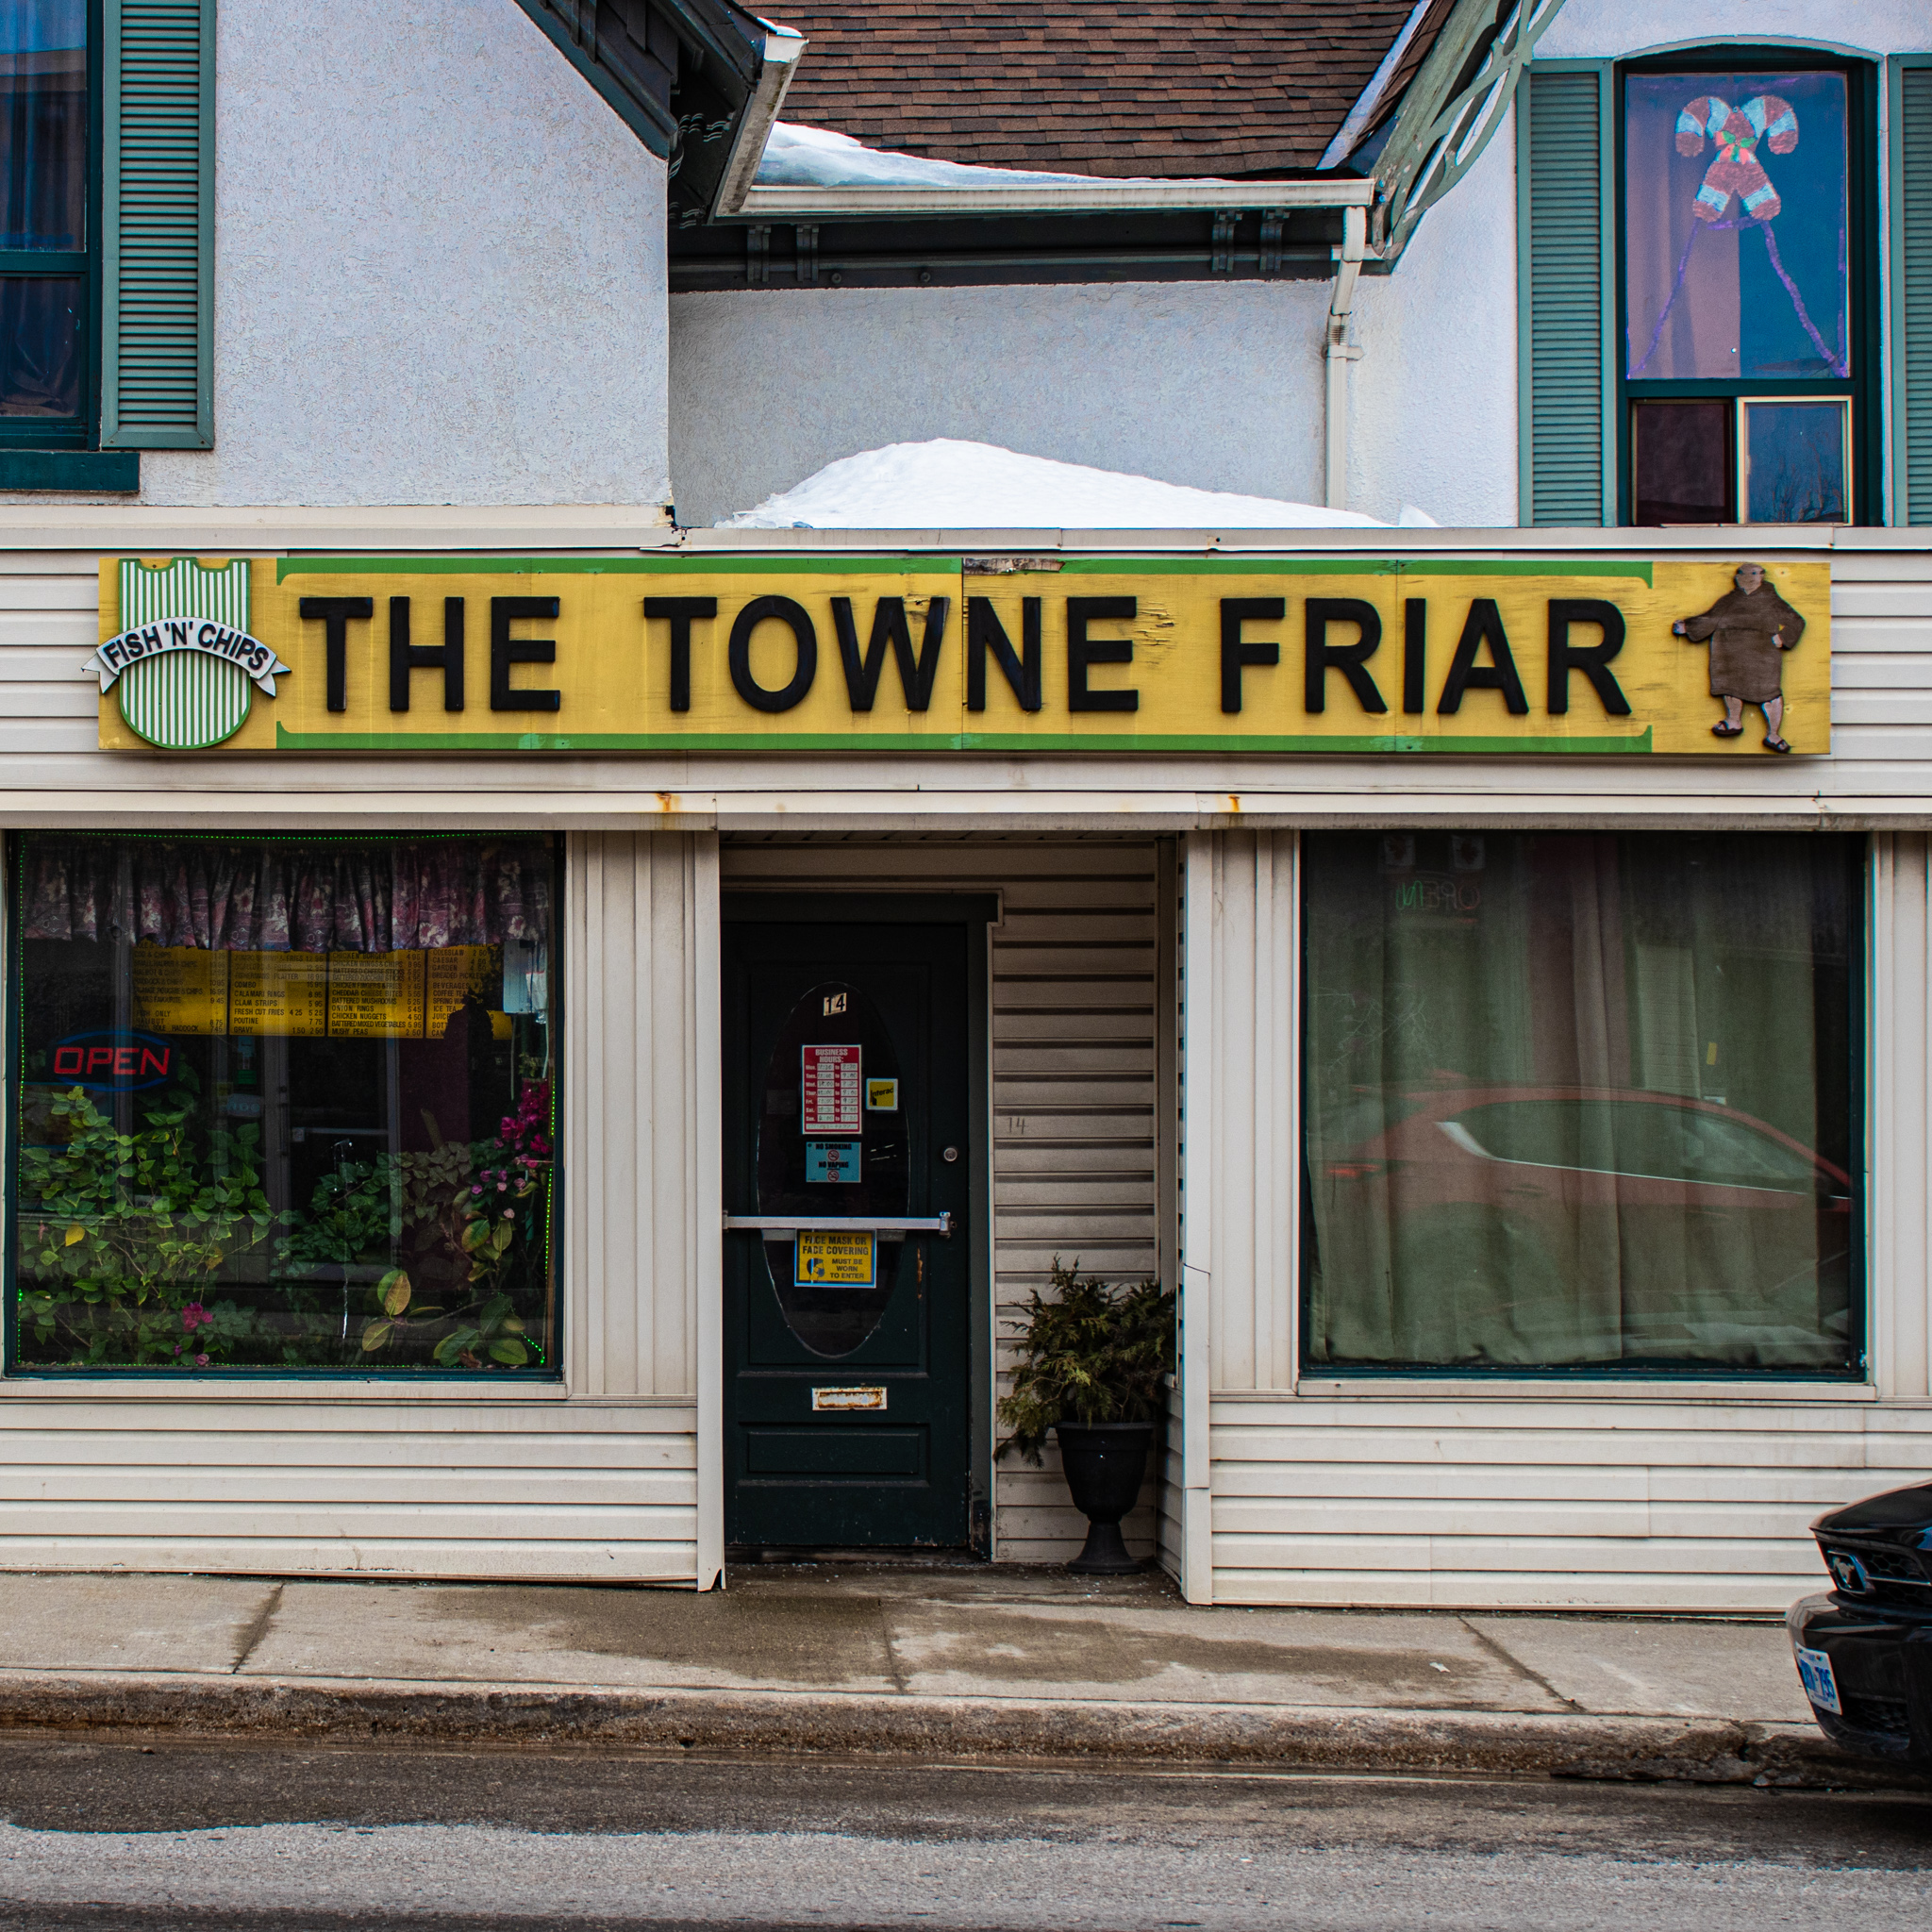 The Towne Friar